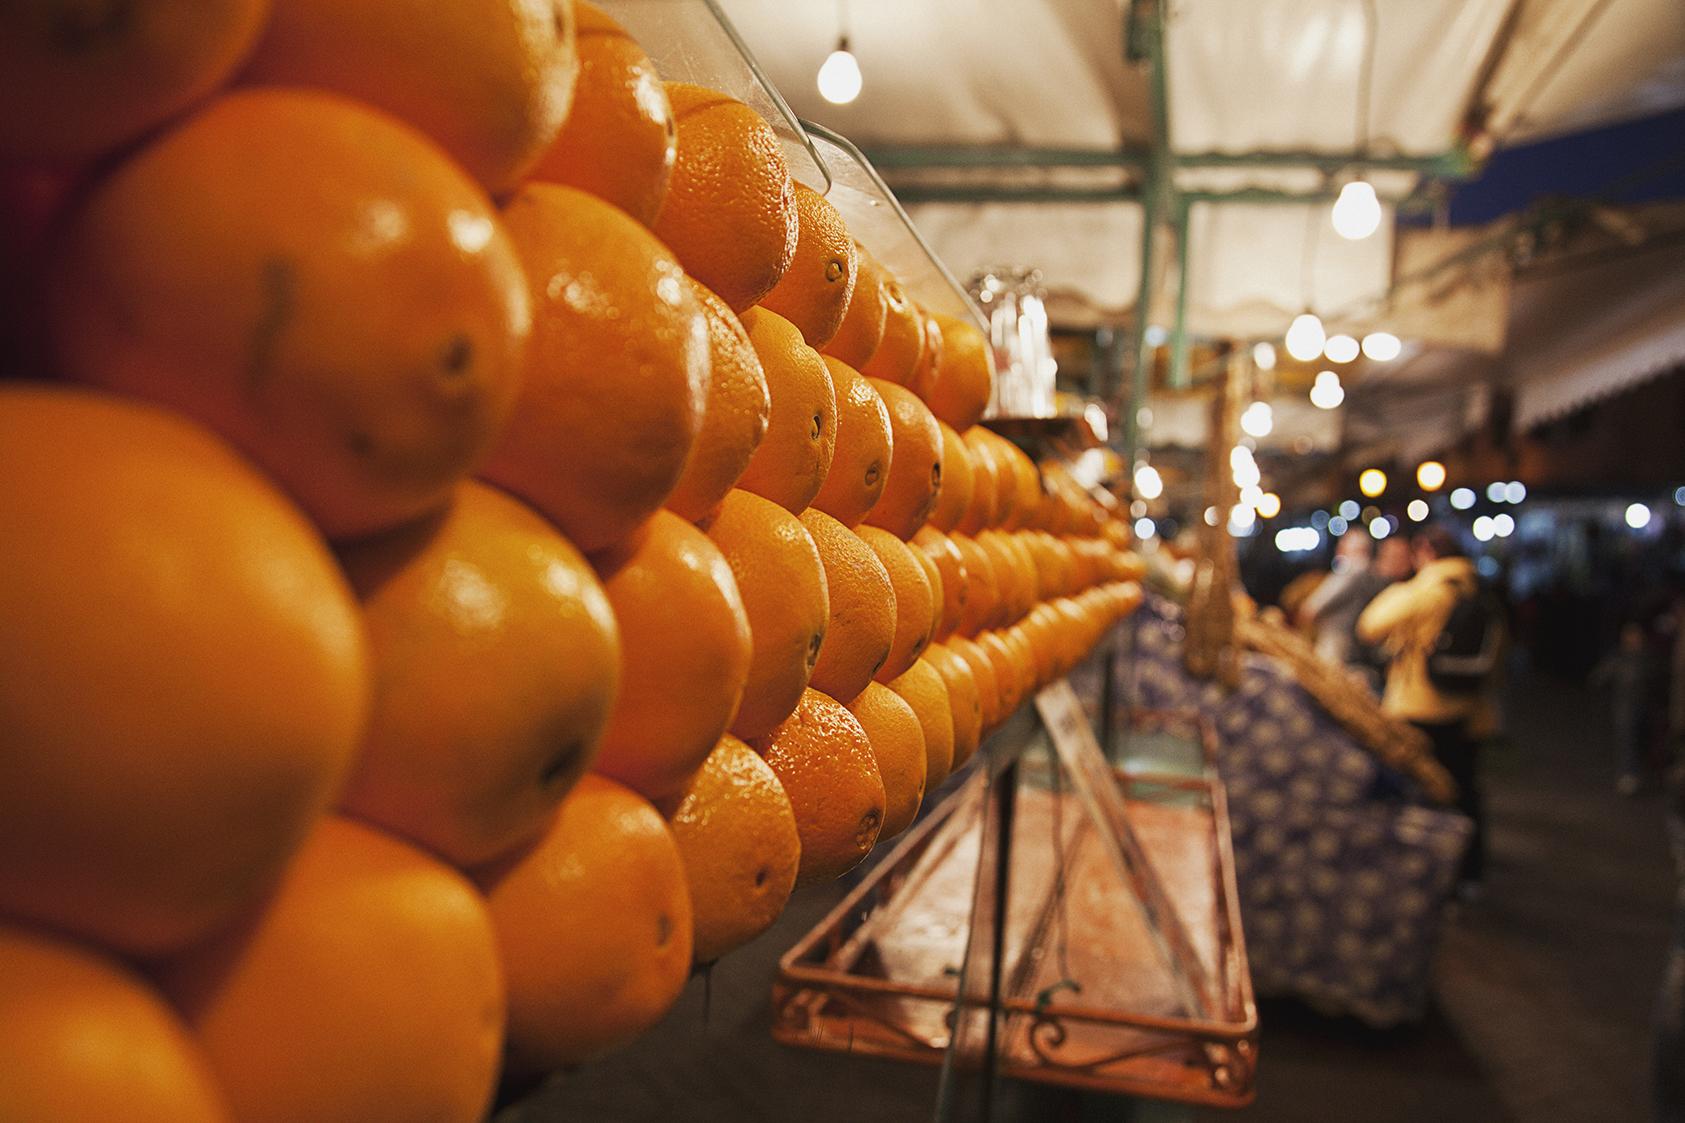 orange-juice-stand-jemaa-el-fnaa-travel-photographer.jpg